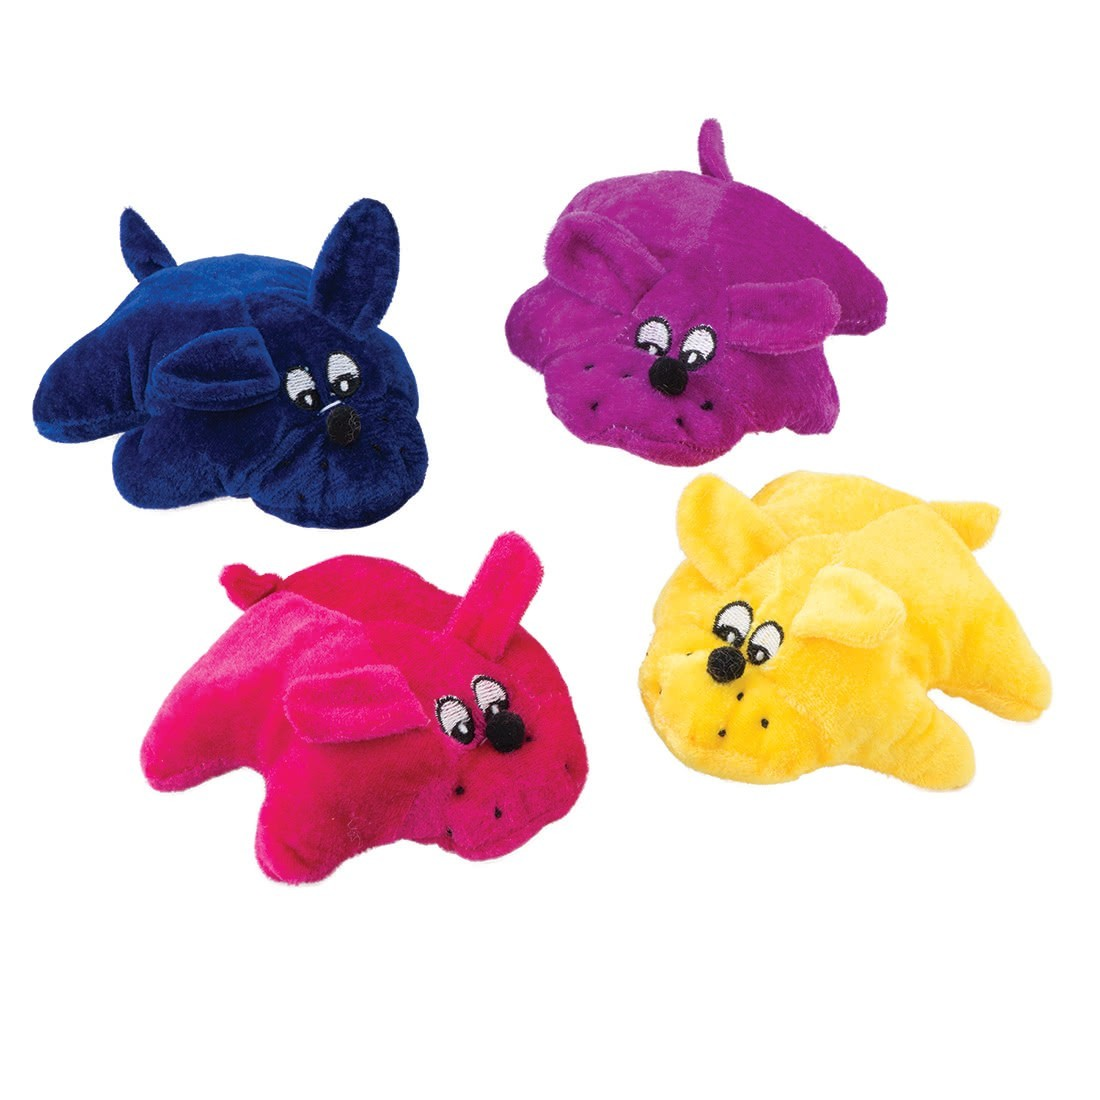 Plush Dogs [image]